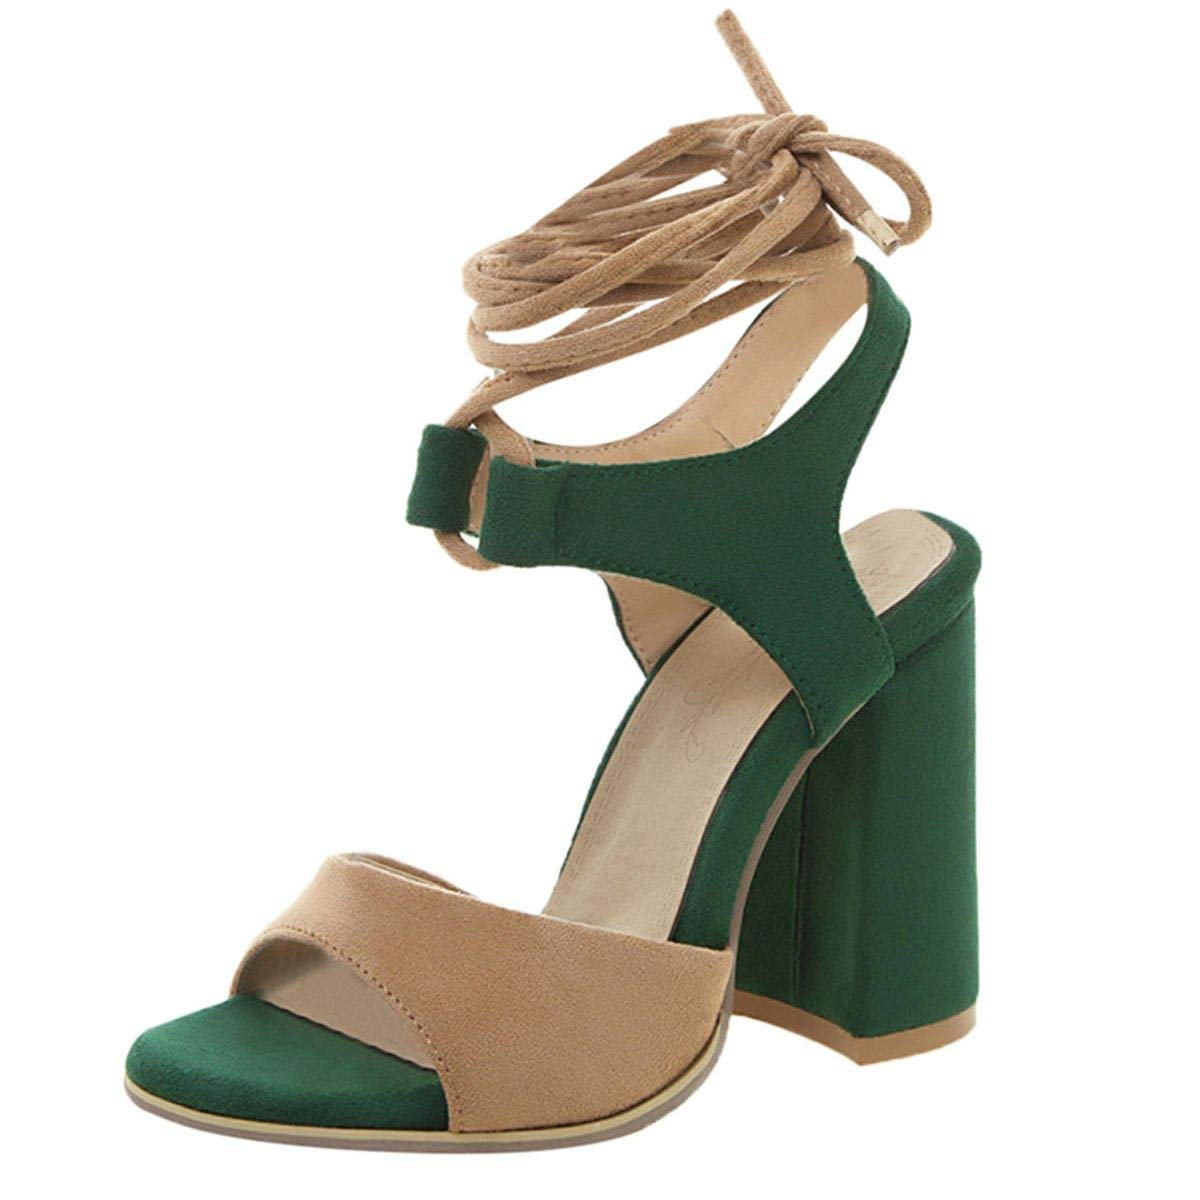 Women's Stacked Block Heel Gladiator Sandal Chunky Block Low Mid Heel Lace Up Heeled Sandals (Green, 7.5)